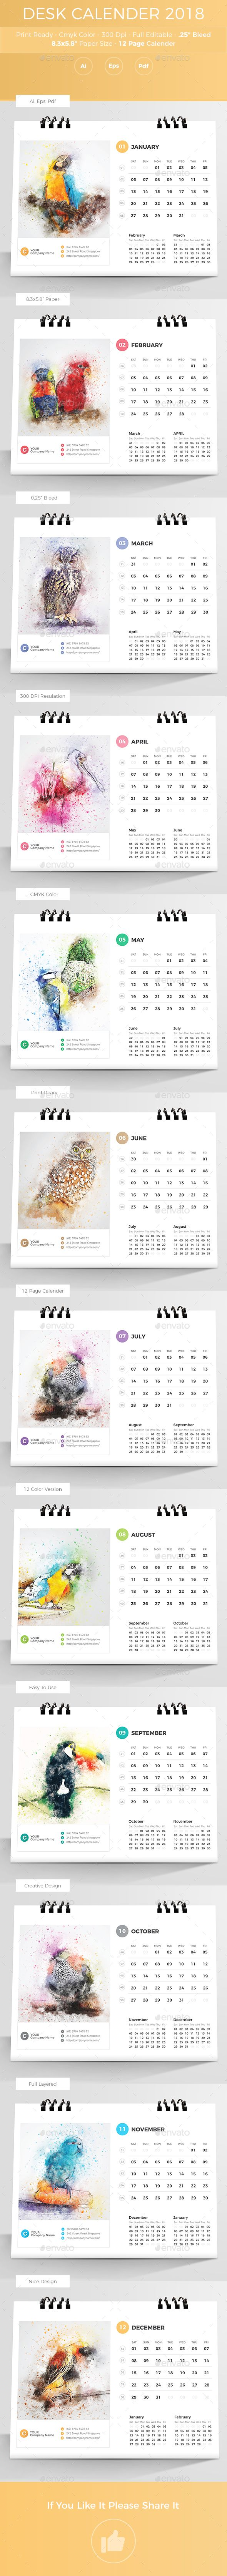 Desk Calender 2018 Template Vector Eps Ai Illustrator Calendar